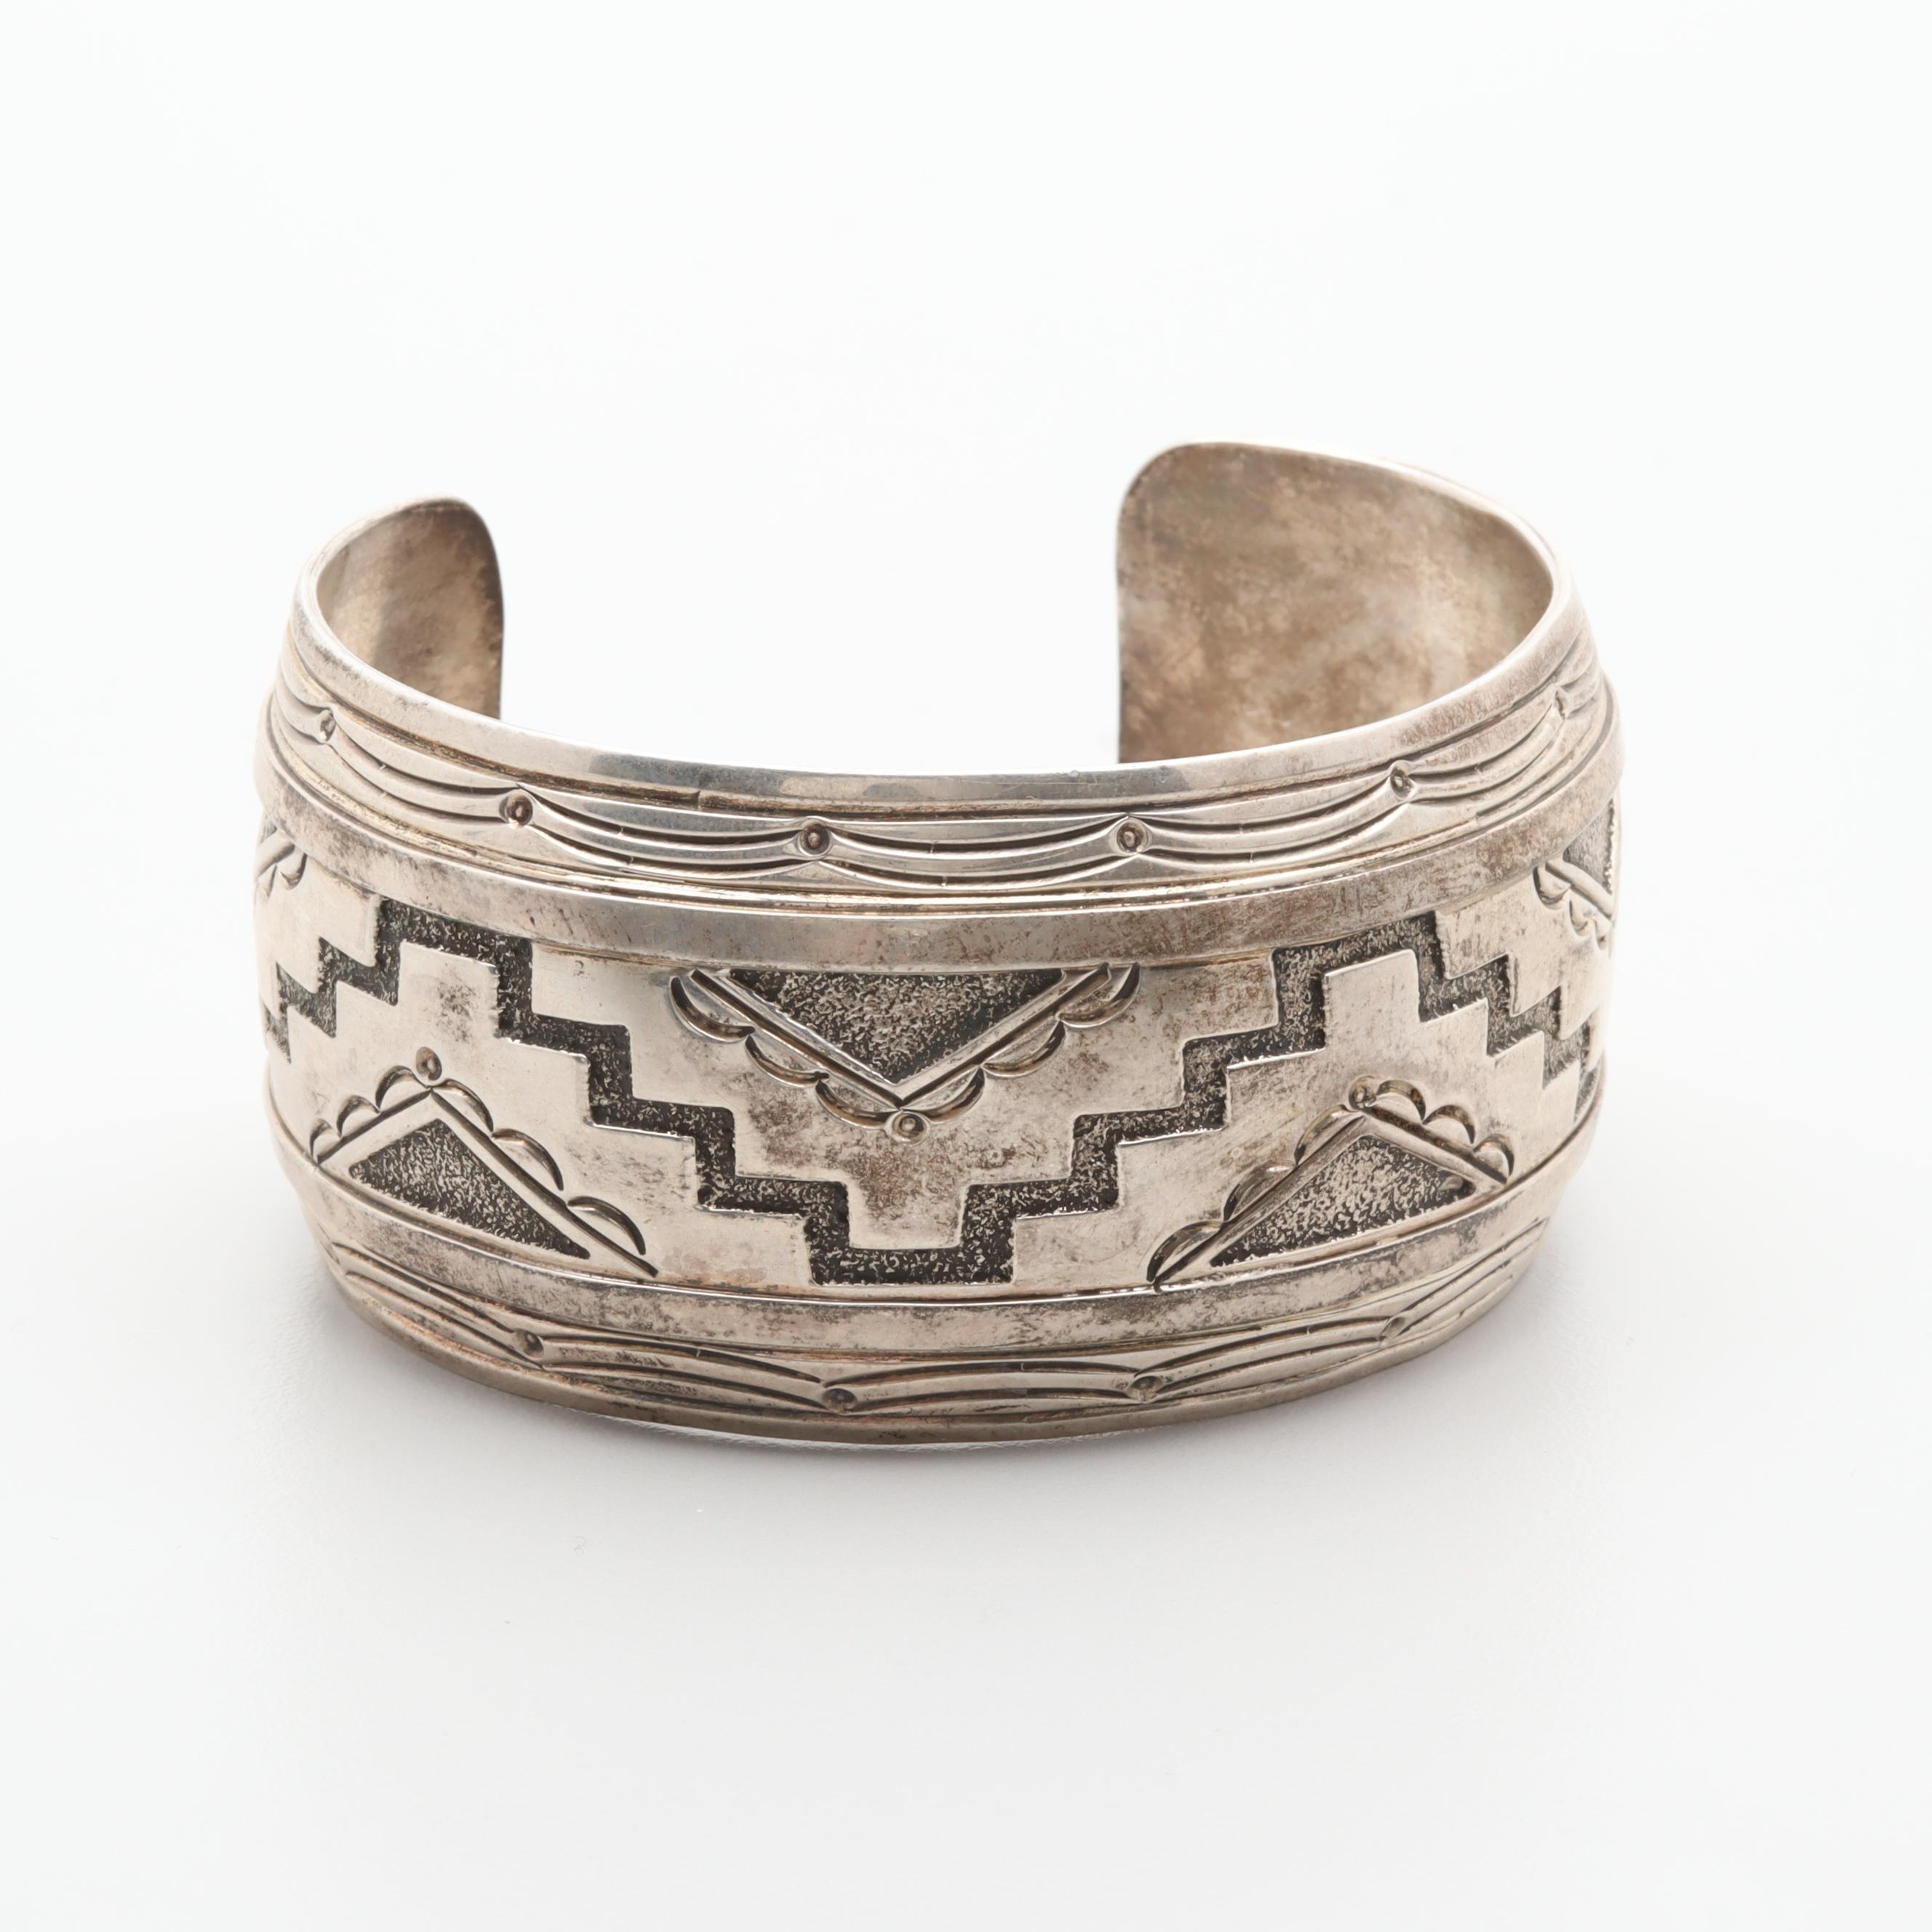 R. Wylie Navajo Diné Sterling Silver Cuff Bracelet